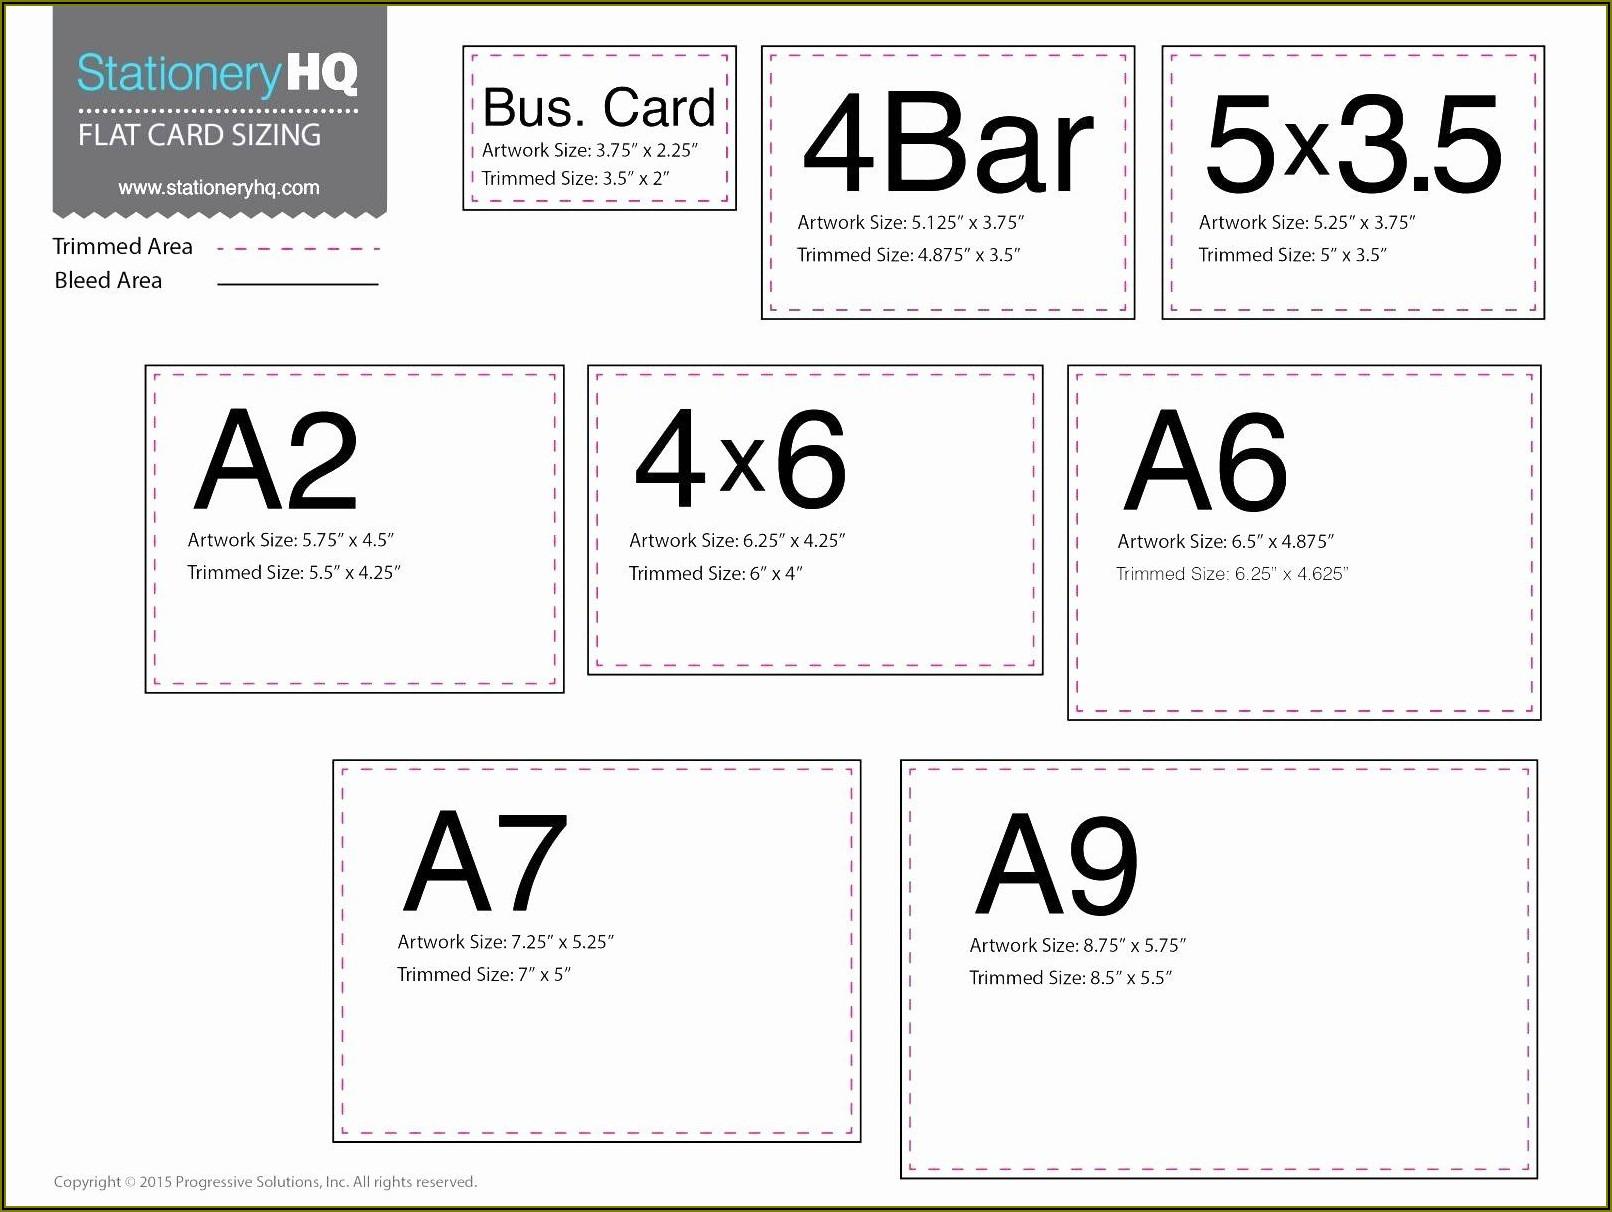 Vistaprint Business Card Size In Pixels